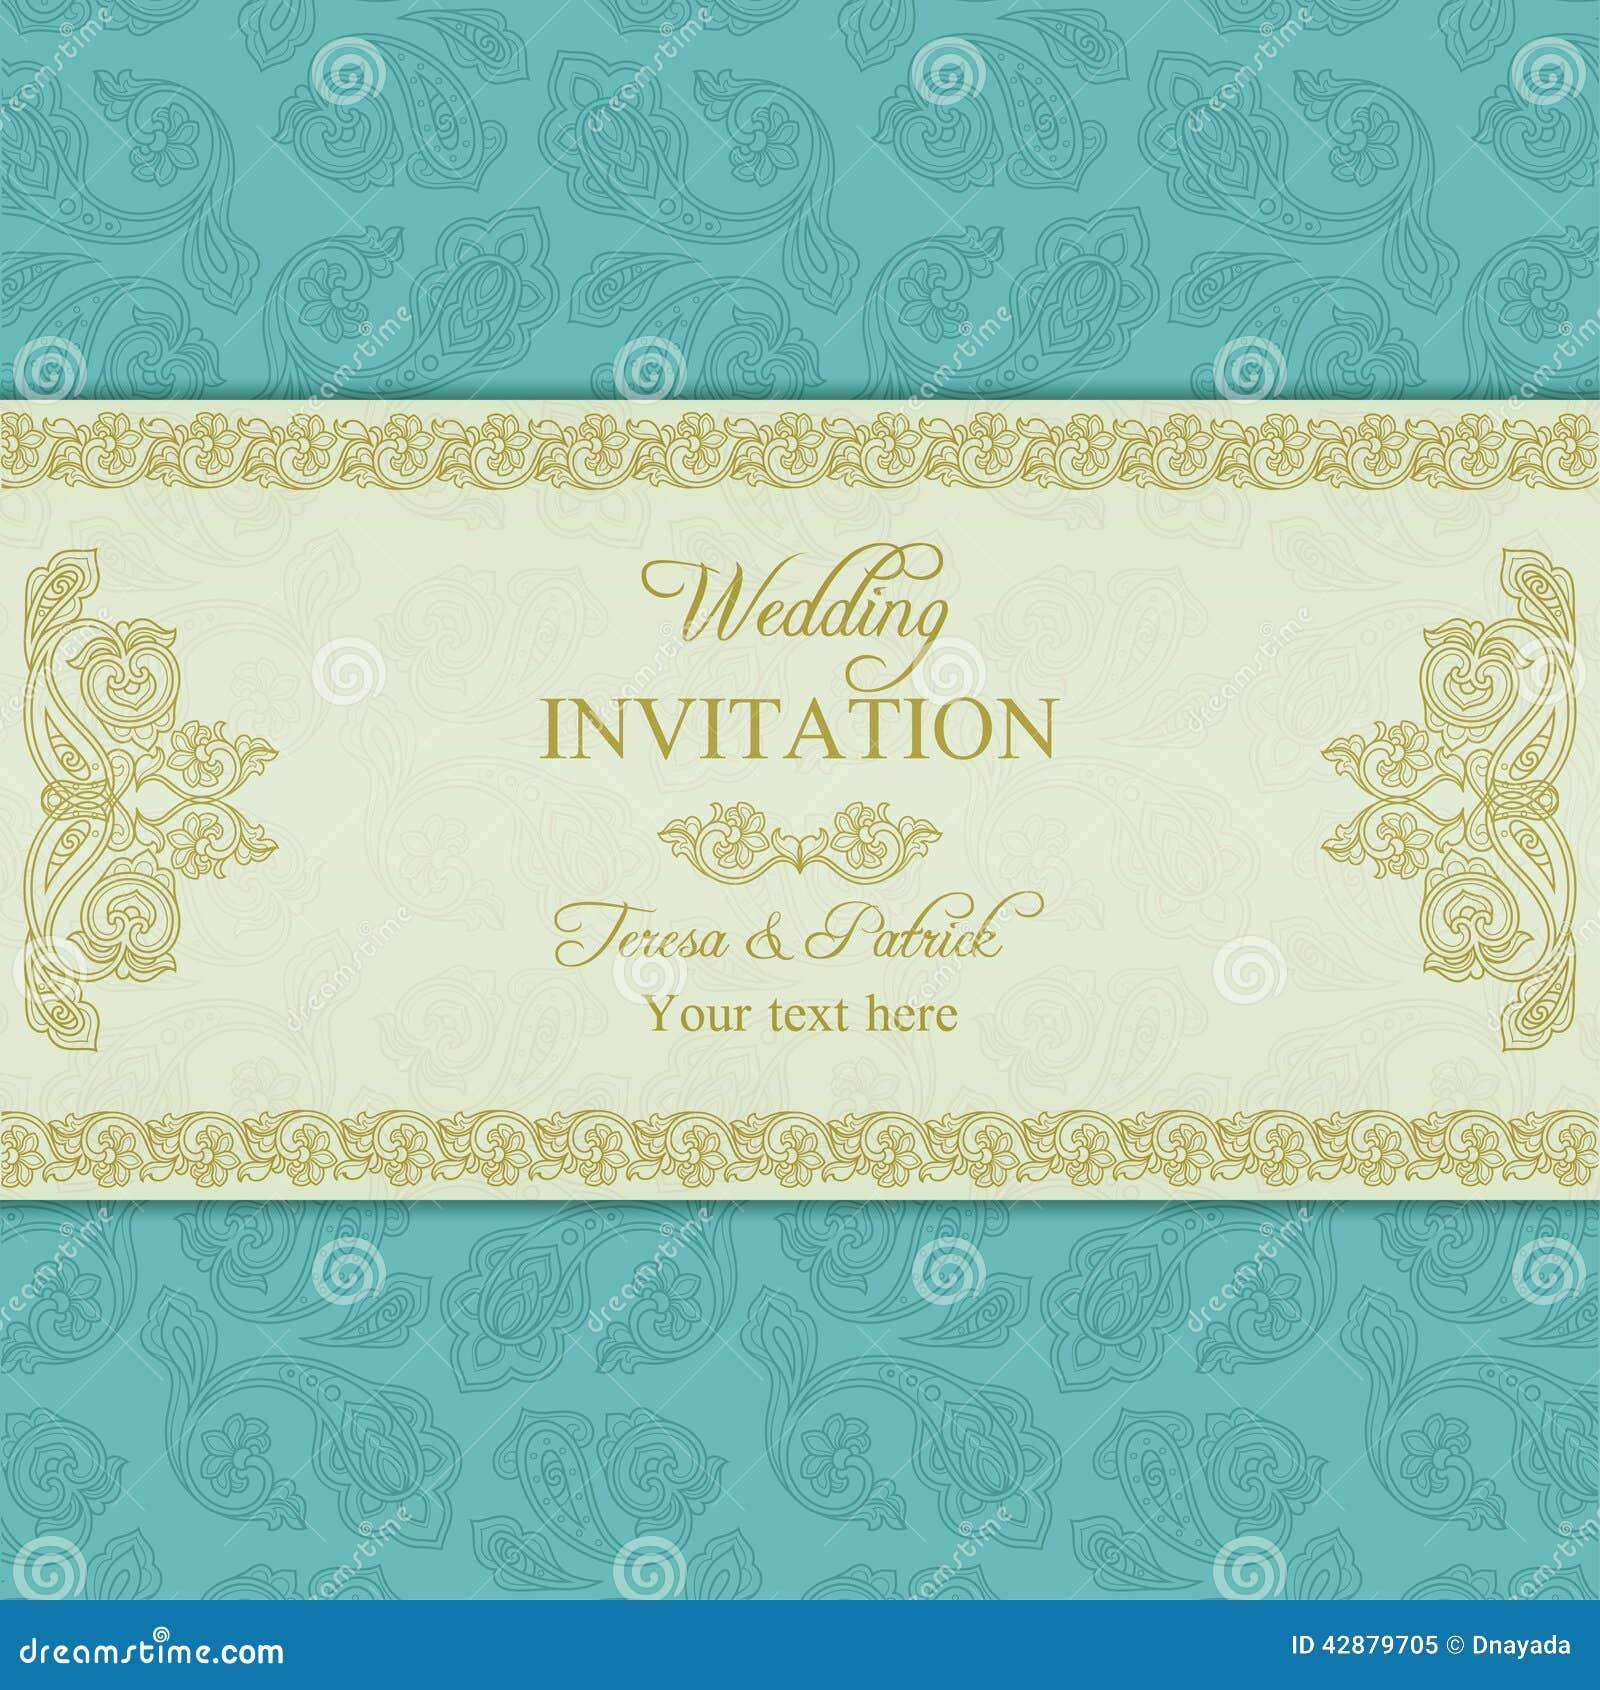 Vintage Wedding Invitation Cards for adorable invitation example